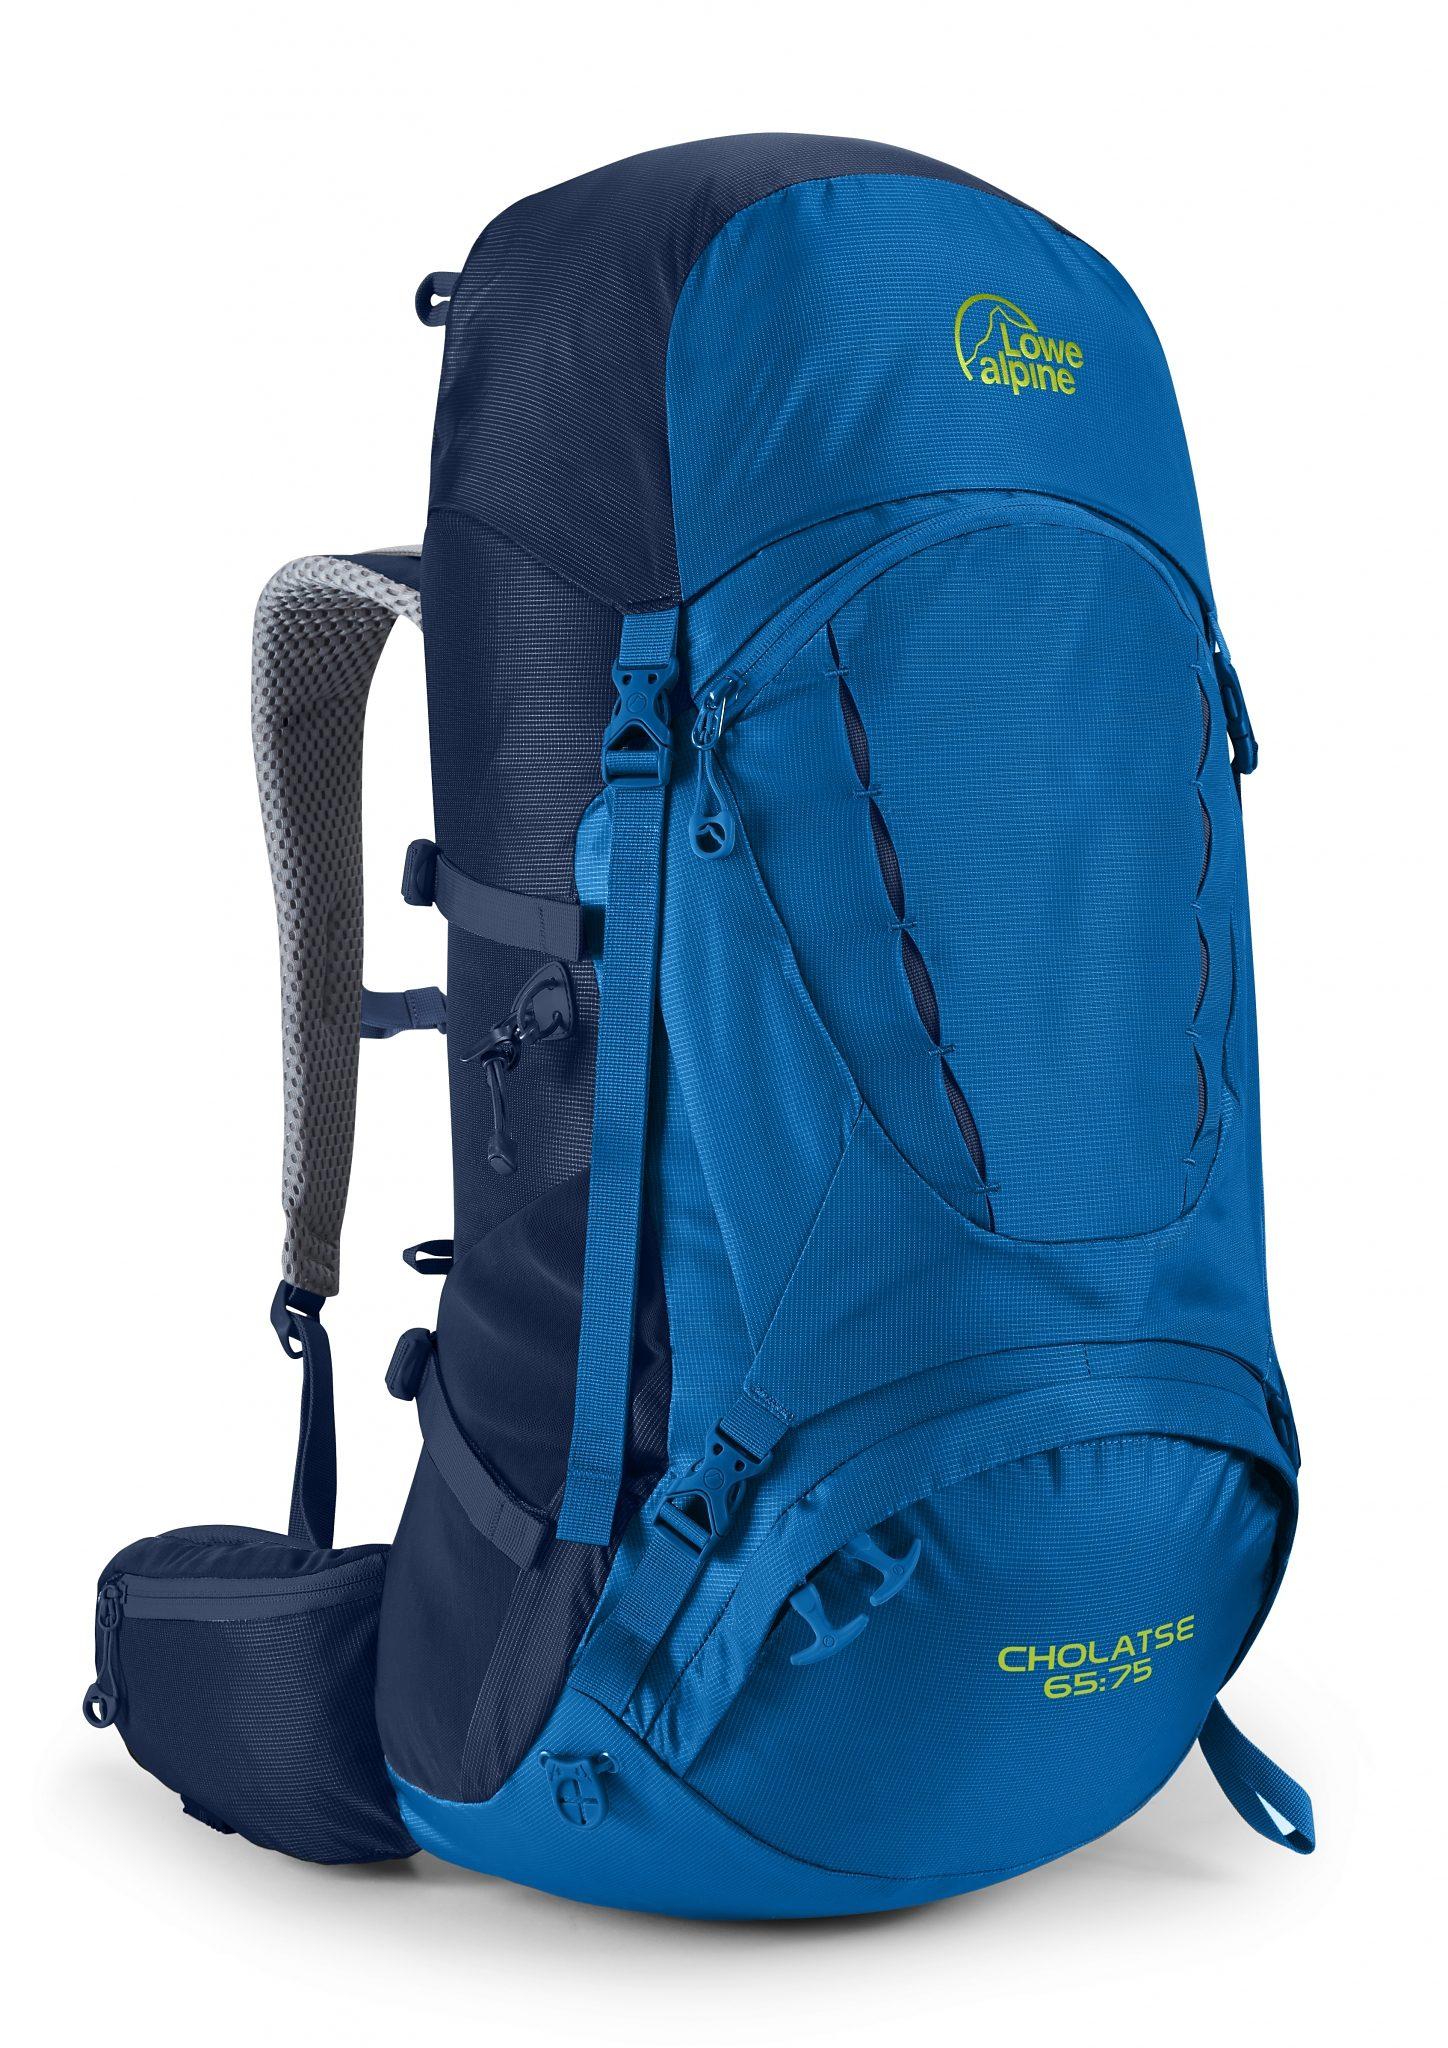 Lowe Alpine Wanderrucksack »Cholatse 65:75 Backpack Men«